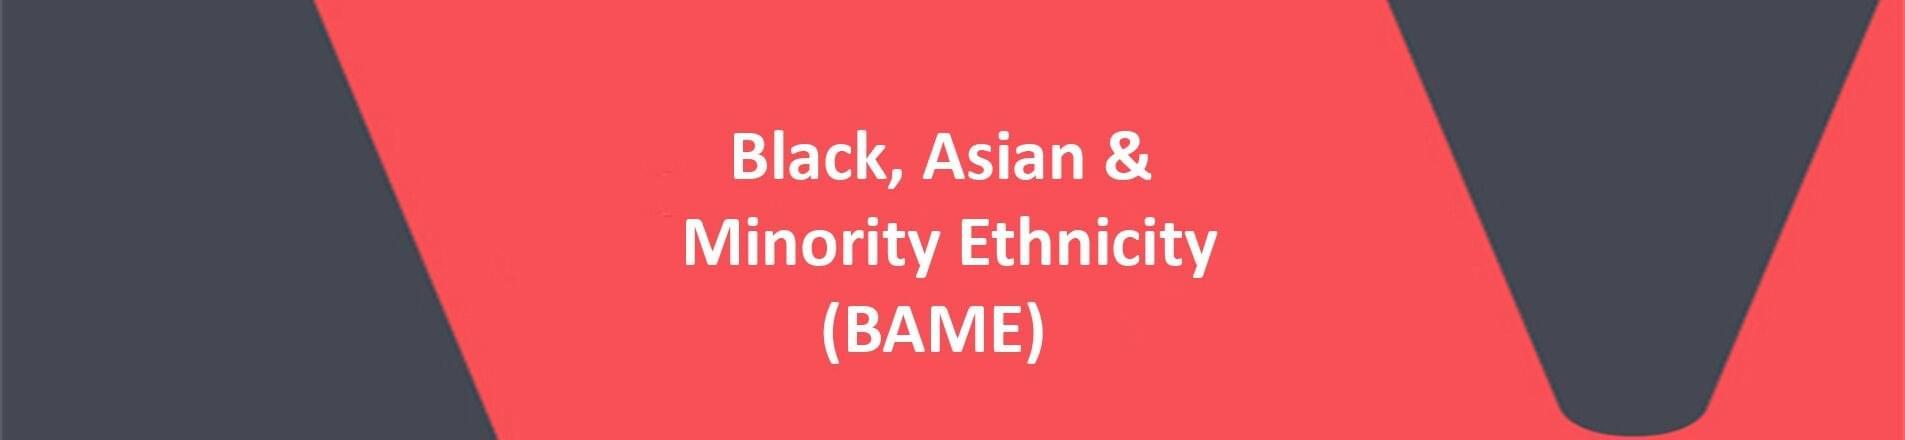 The acronym 'BAME' on red VERCIDA background